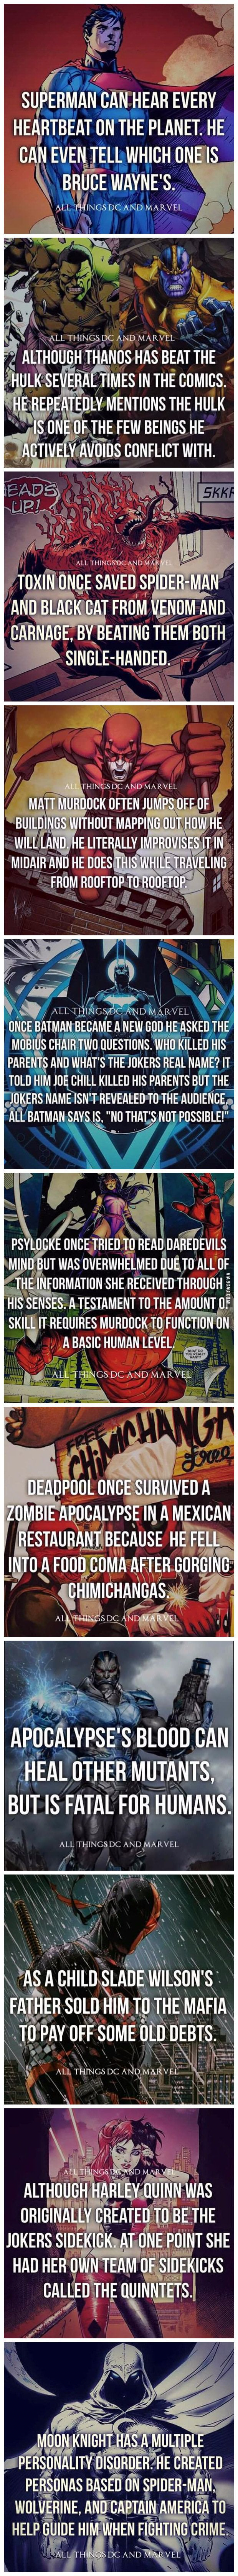 Superhero Facts: Part 1 - 9GAG